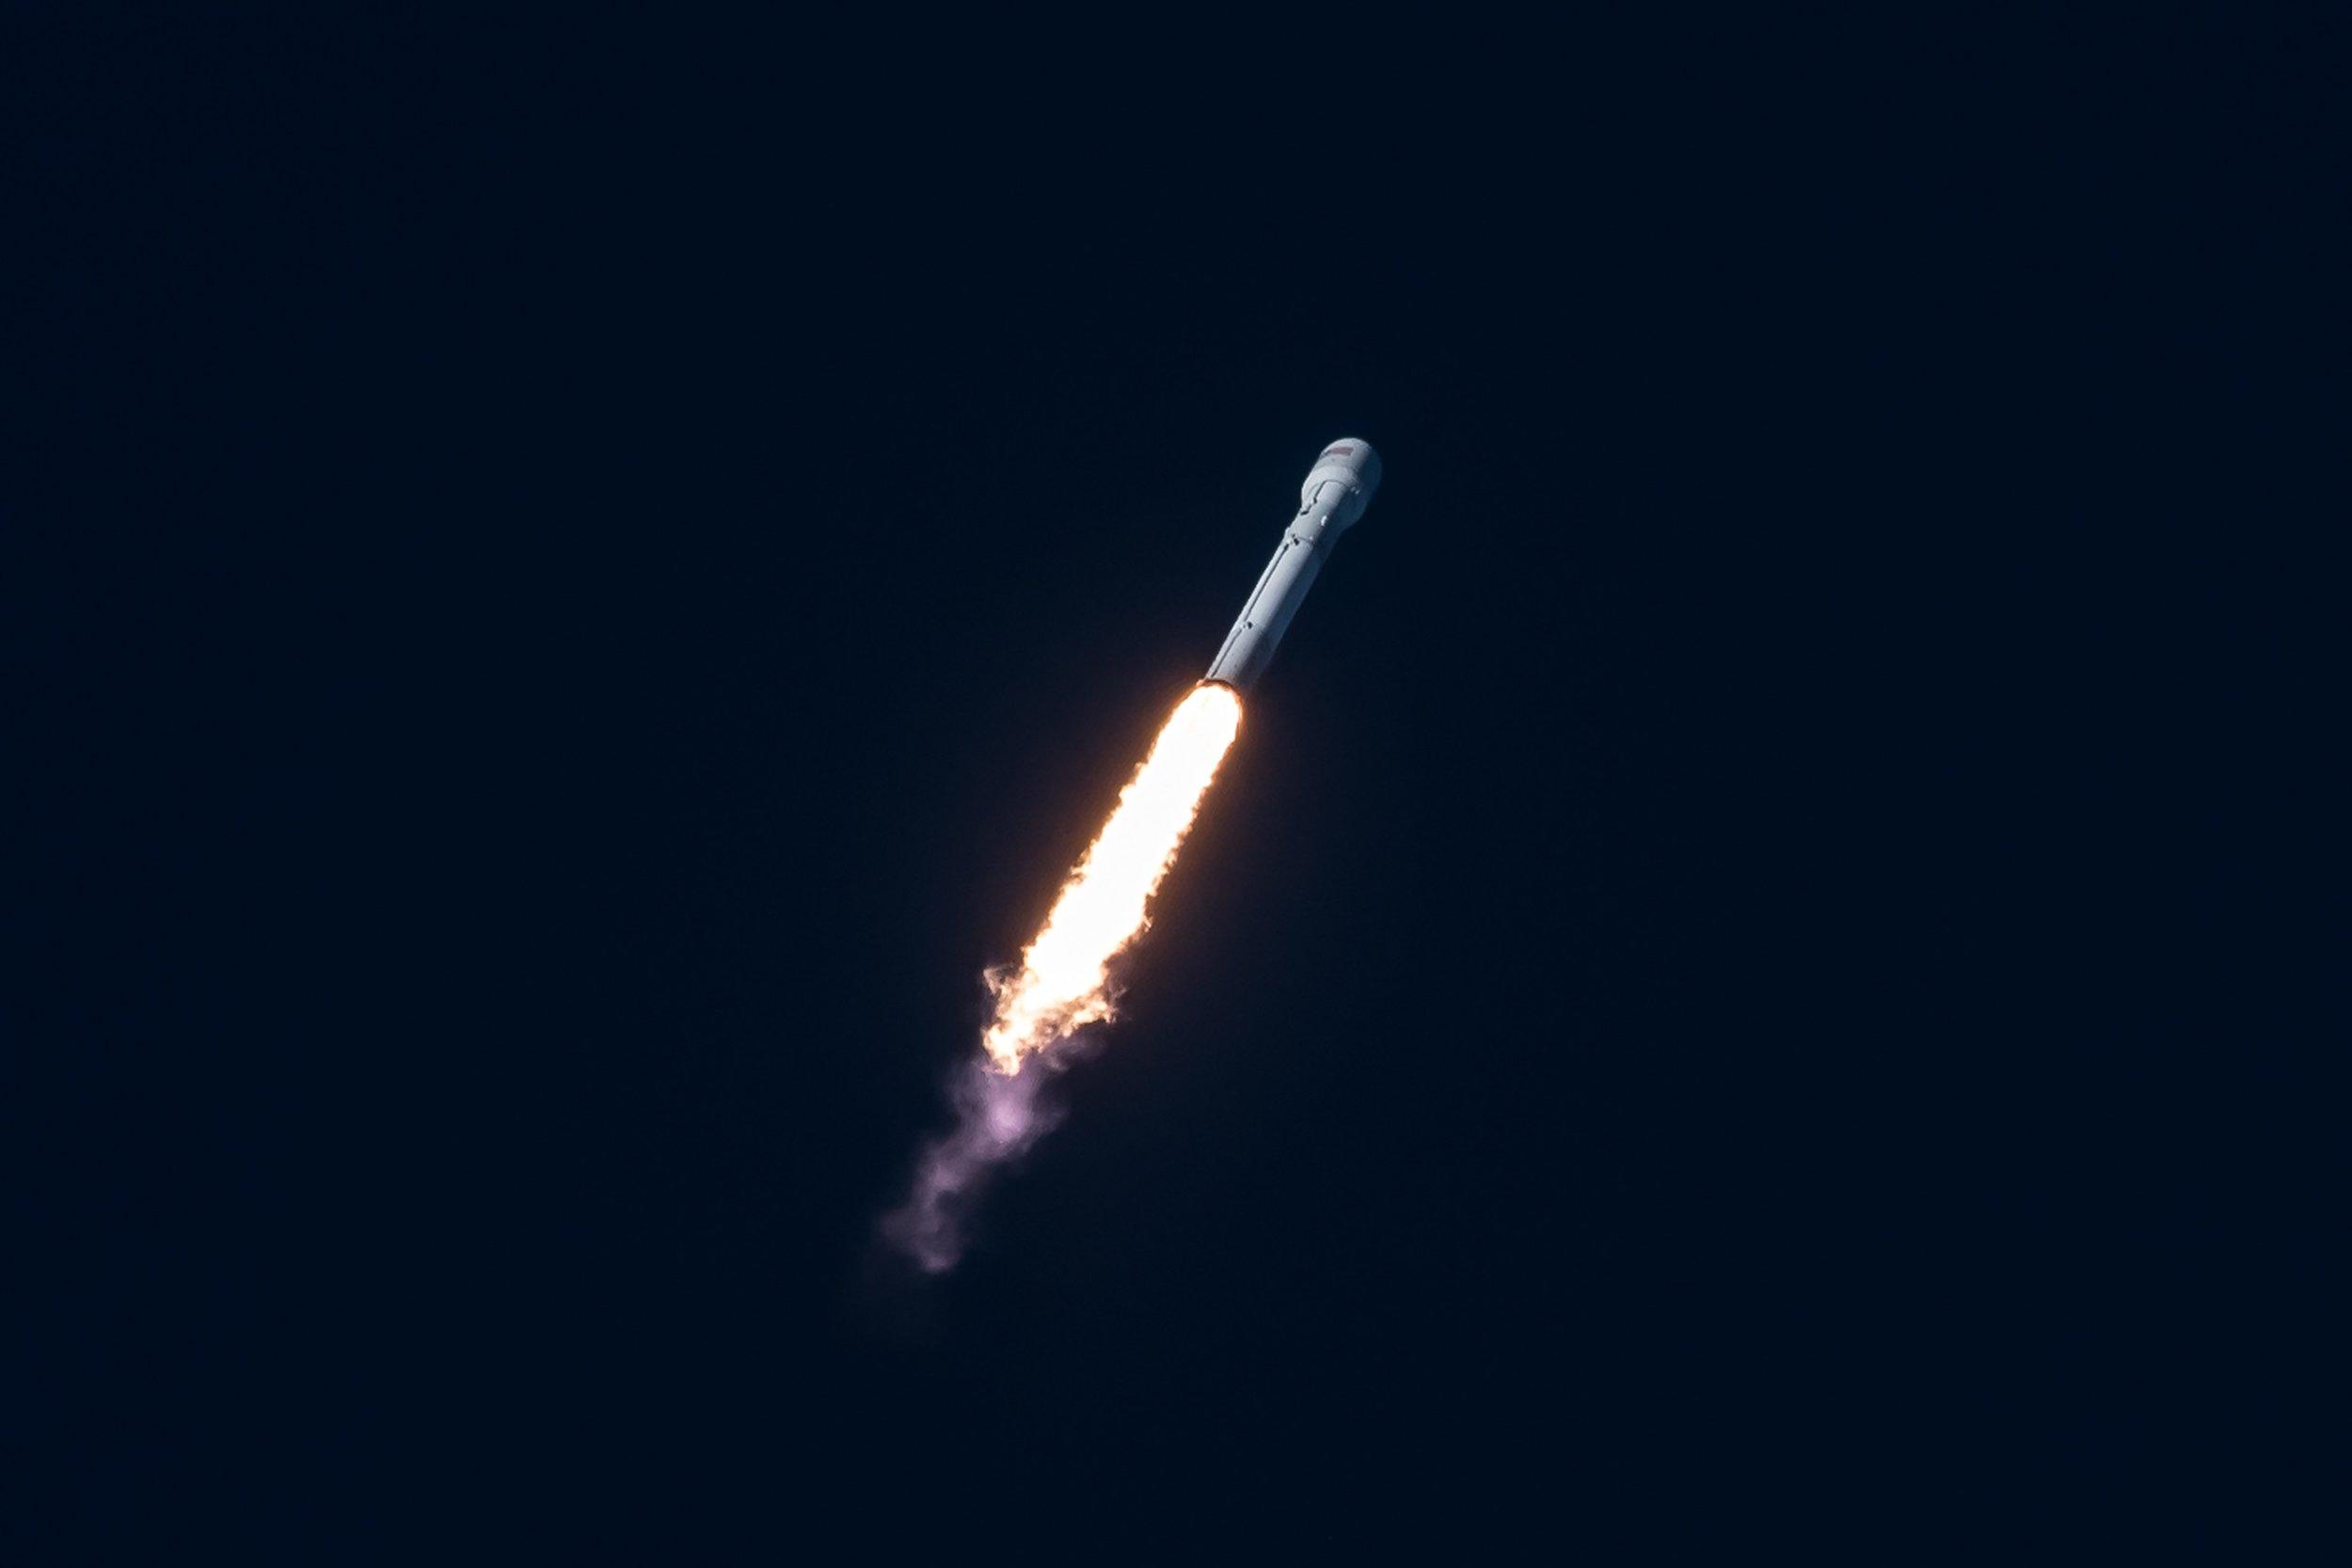 spacex-530588-unsplash.jpg